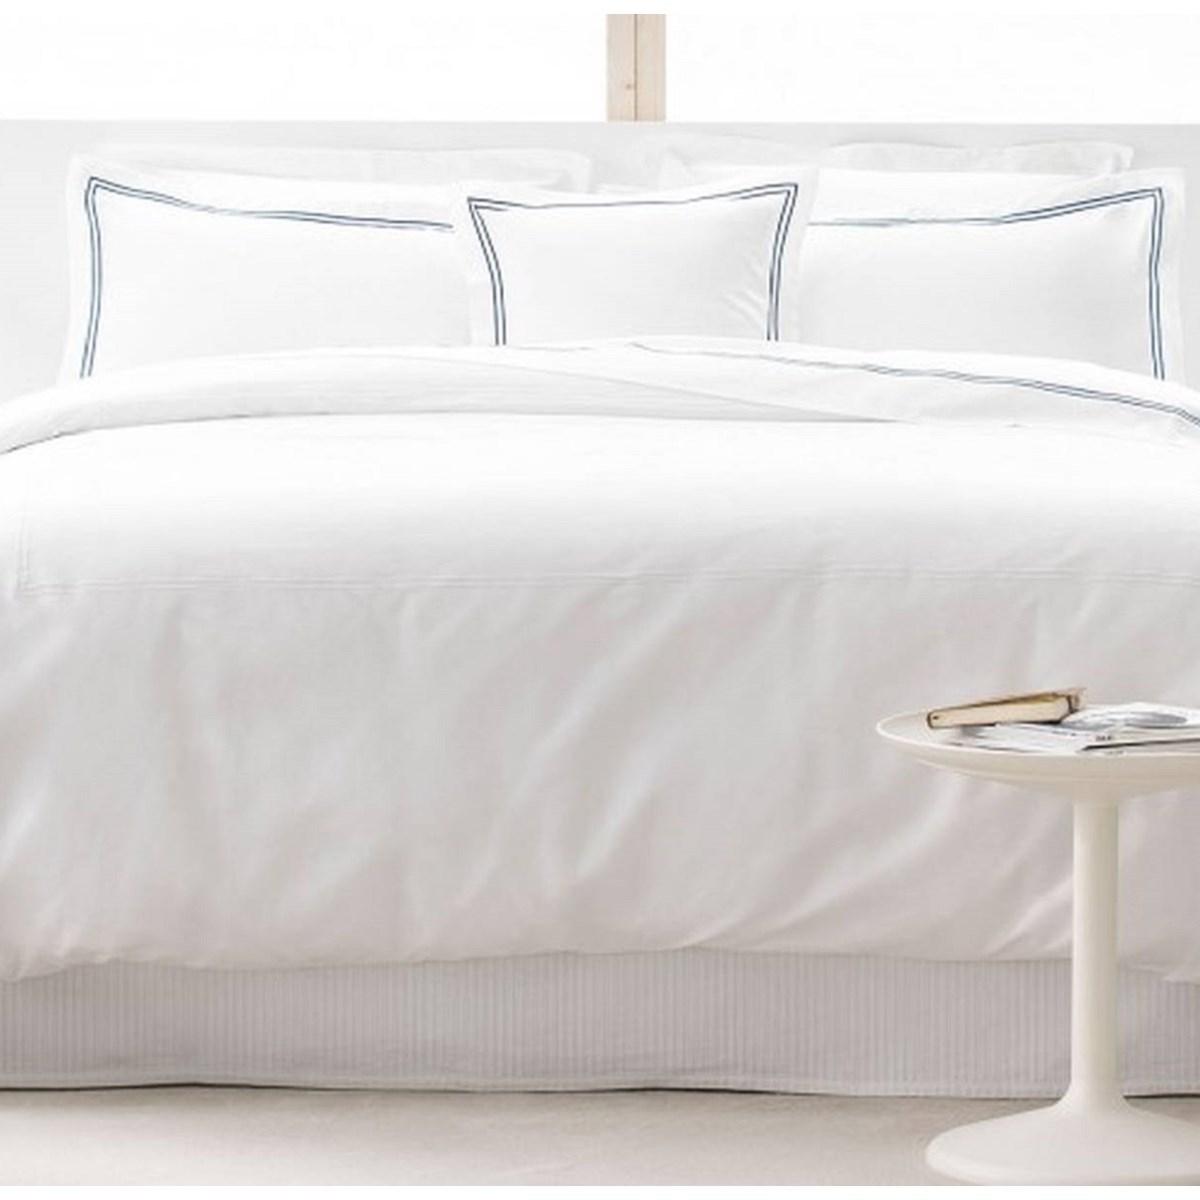 Drap plat luxe en Satin de coton Bleu 270x310 cm